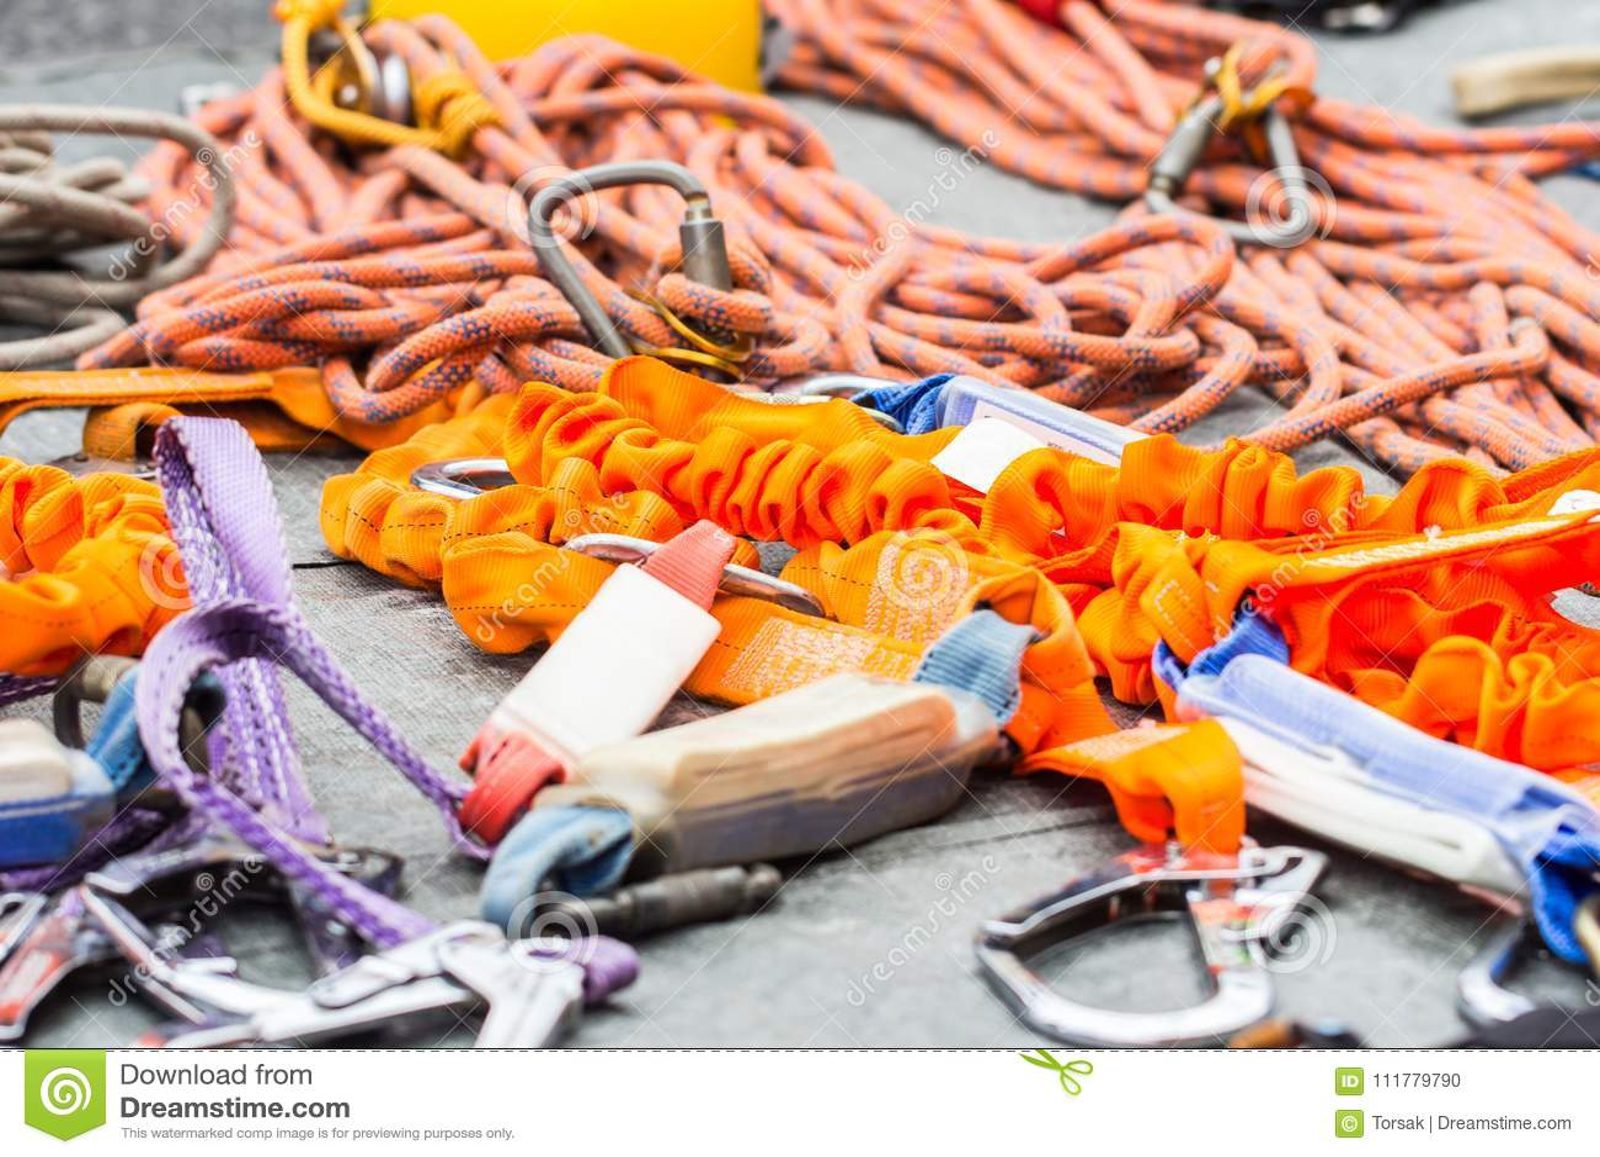 Safety equipment on floor